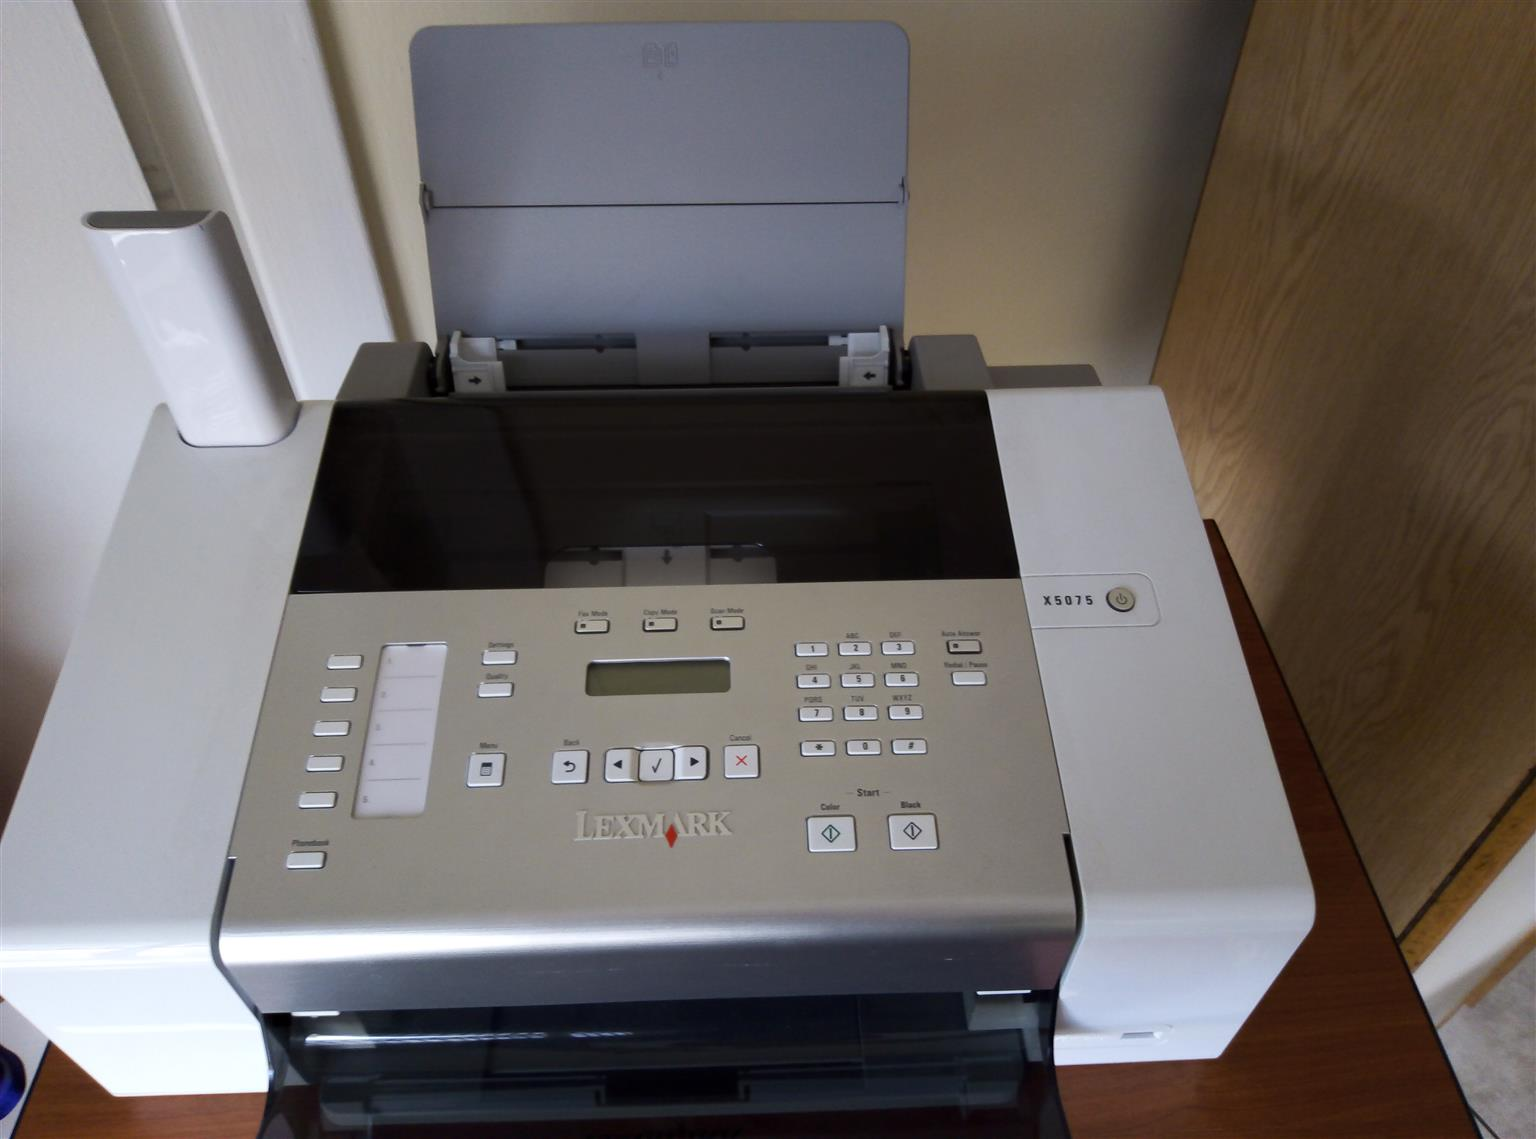 Second Hand Canon, Lexmark and Hewlett Packard Deskjet Printers for sale